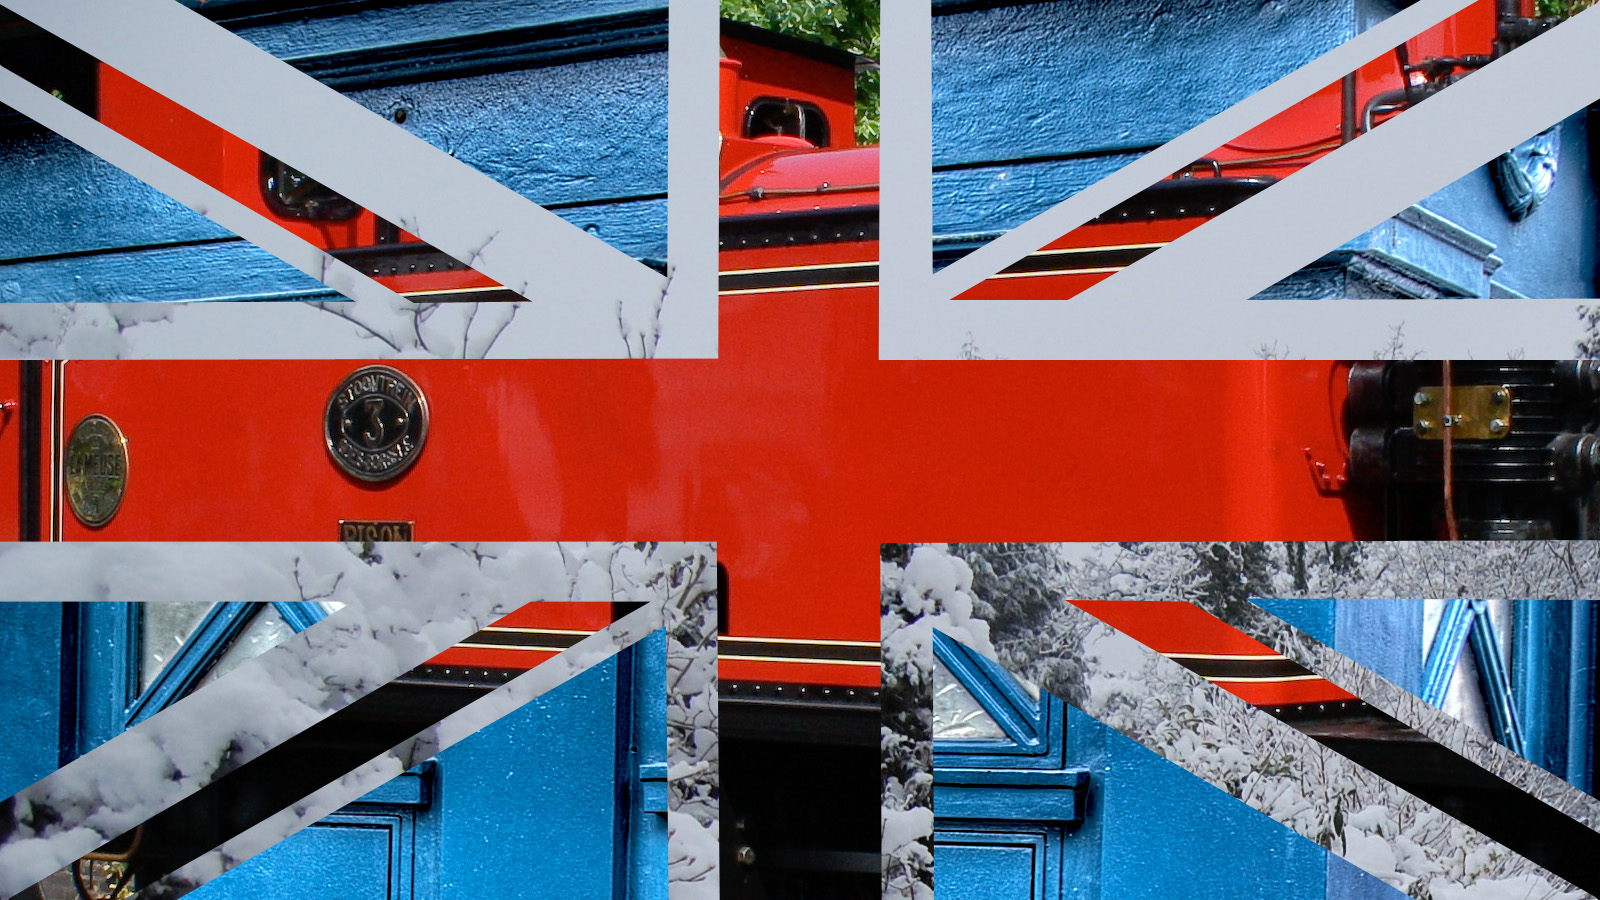 free desktop wallpaper downloads uk